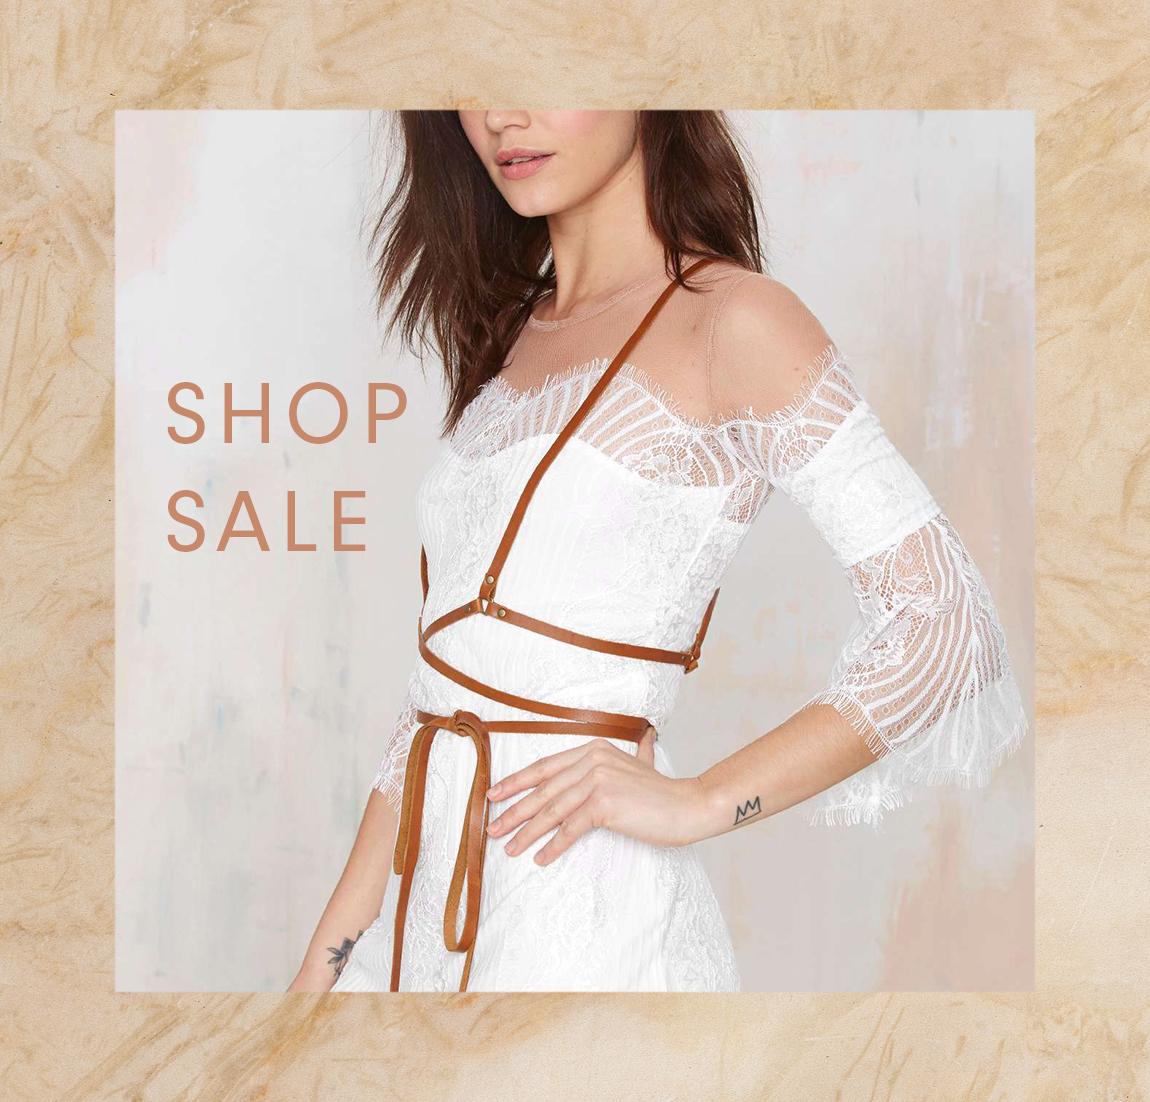 Shop-Sale1.jpg